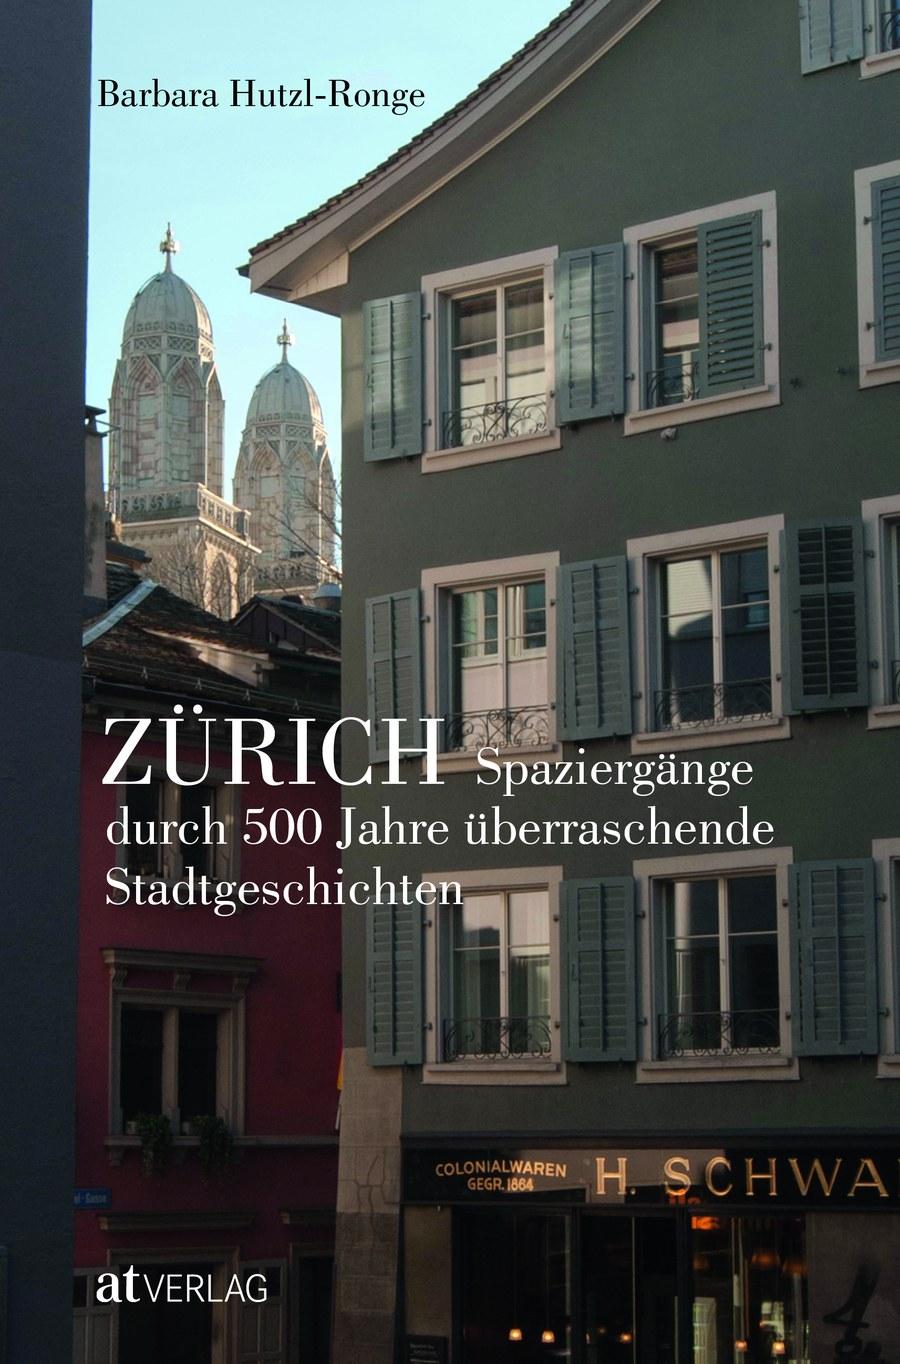 Cover_Zuerich_Spaziergaenge.jpg